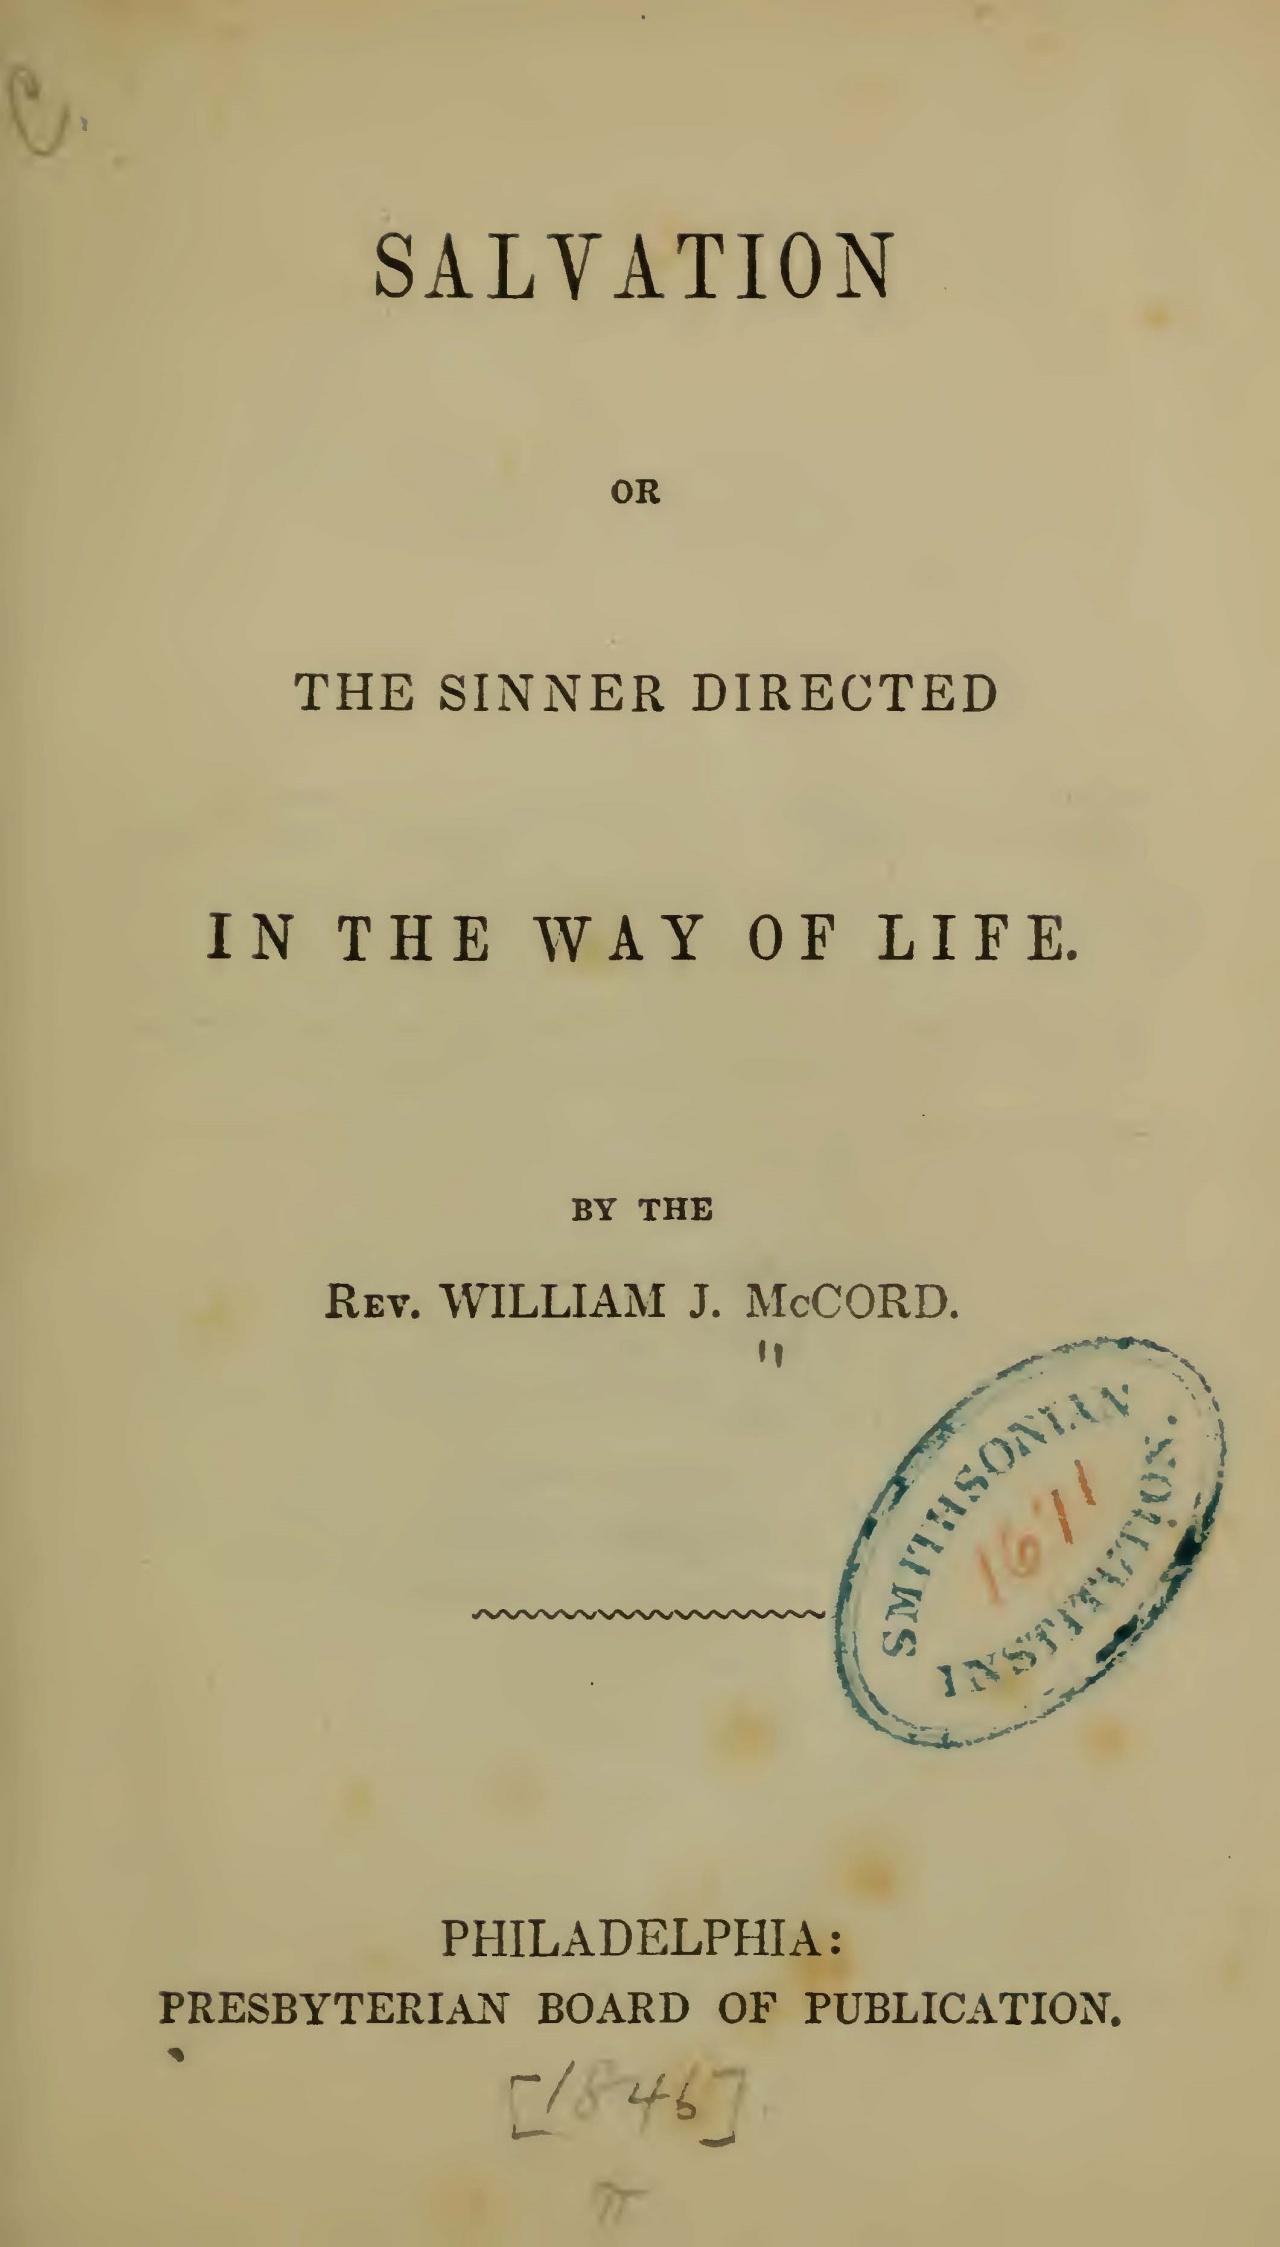 McCord, William J., Salvation Title Page.jpg